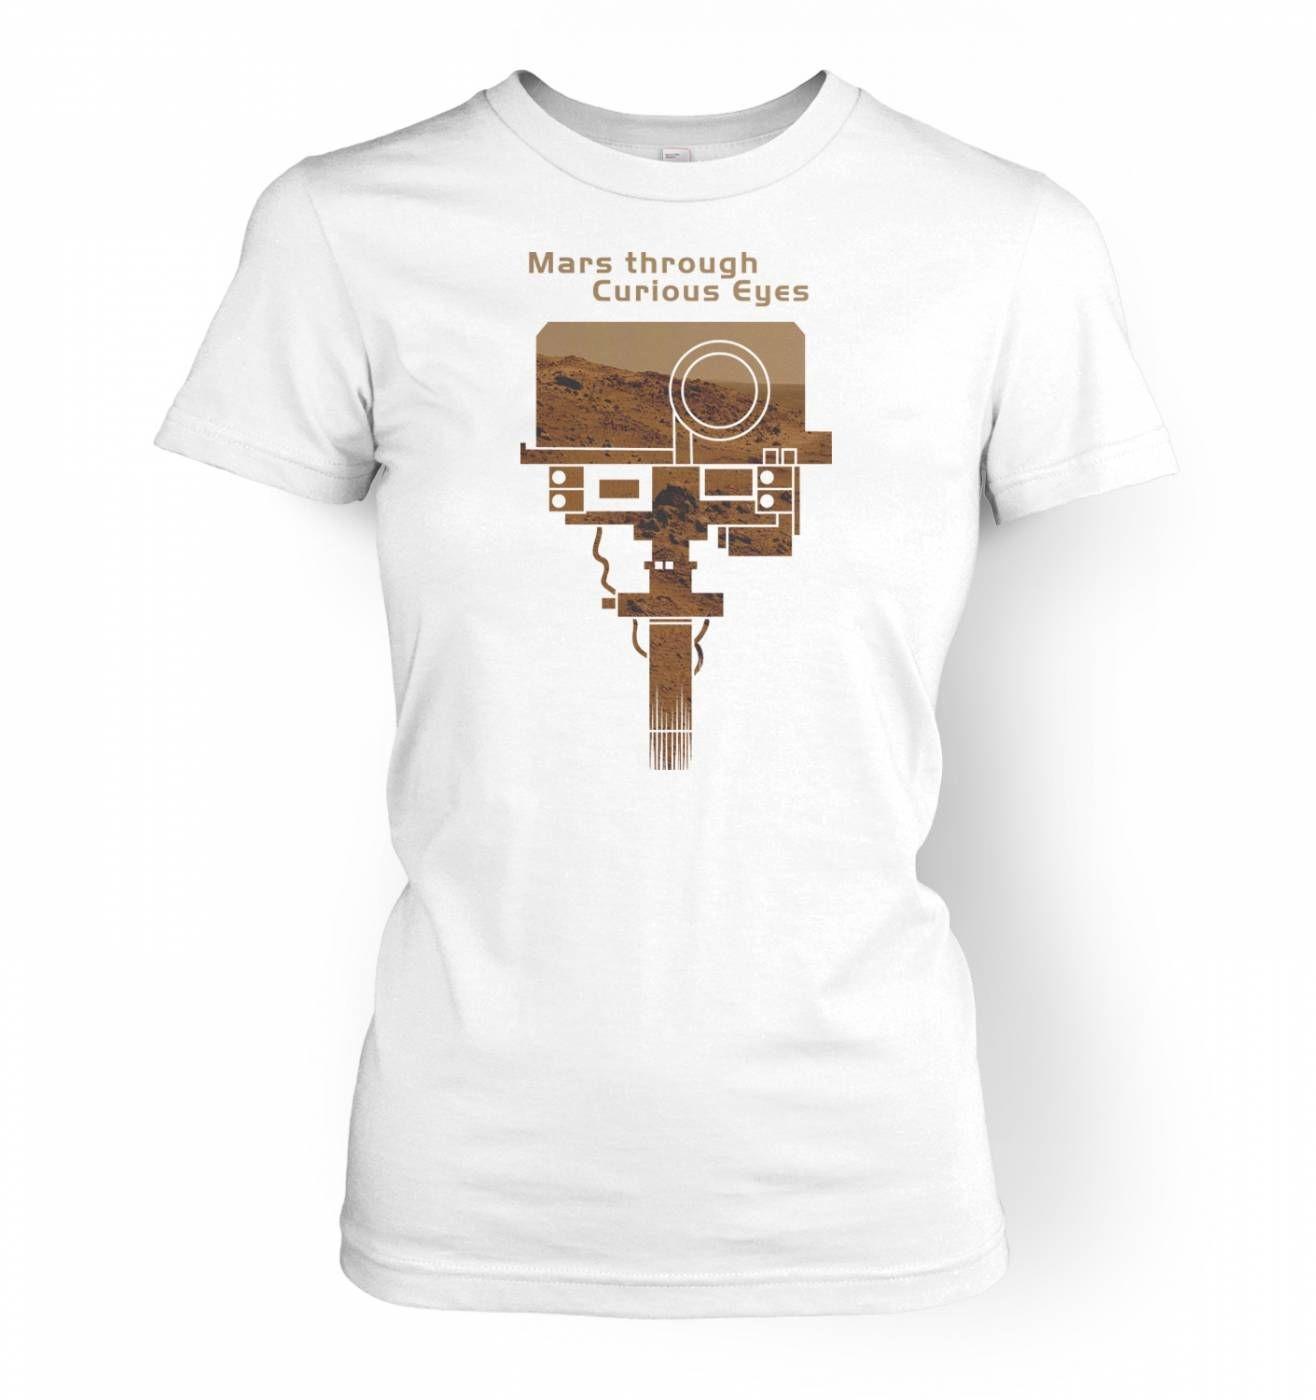 Mars Through Curious Eyes women's t-shirt